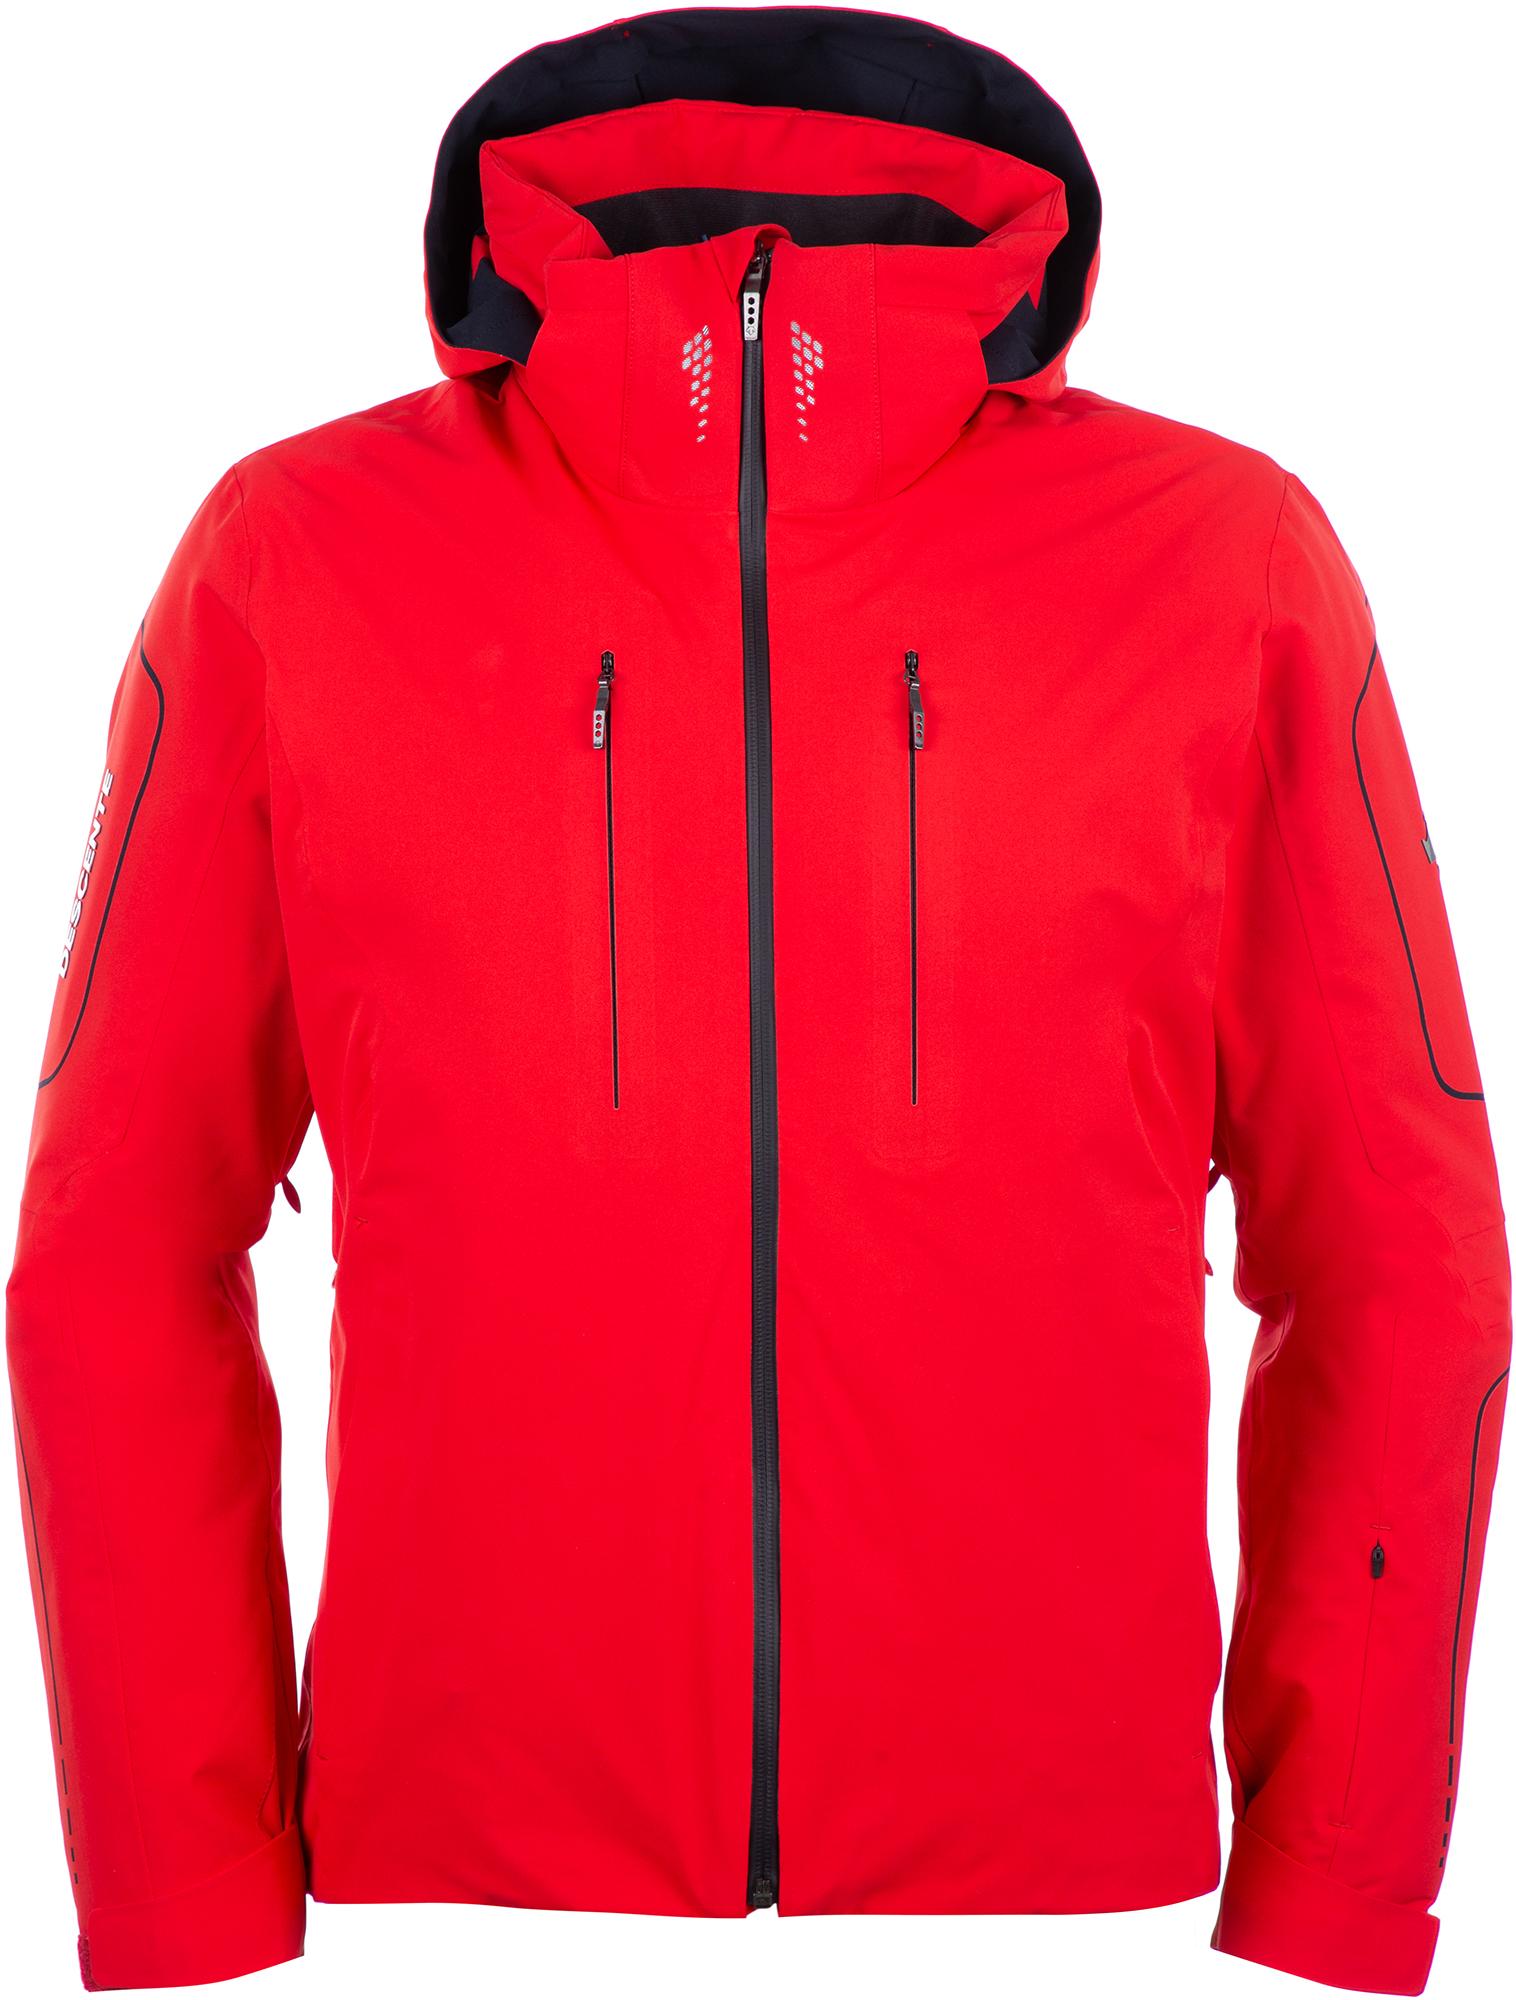 Descente Куртка утепленная мужская Isak, размер 58